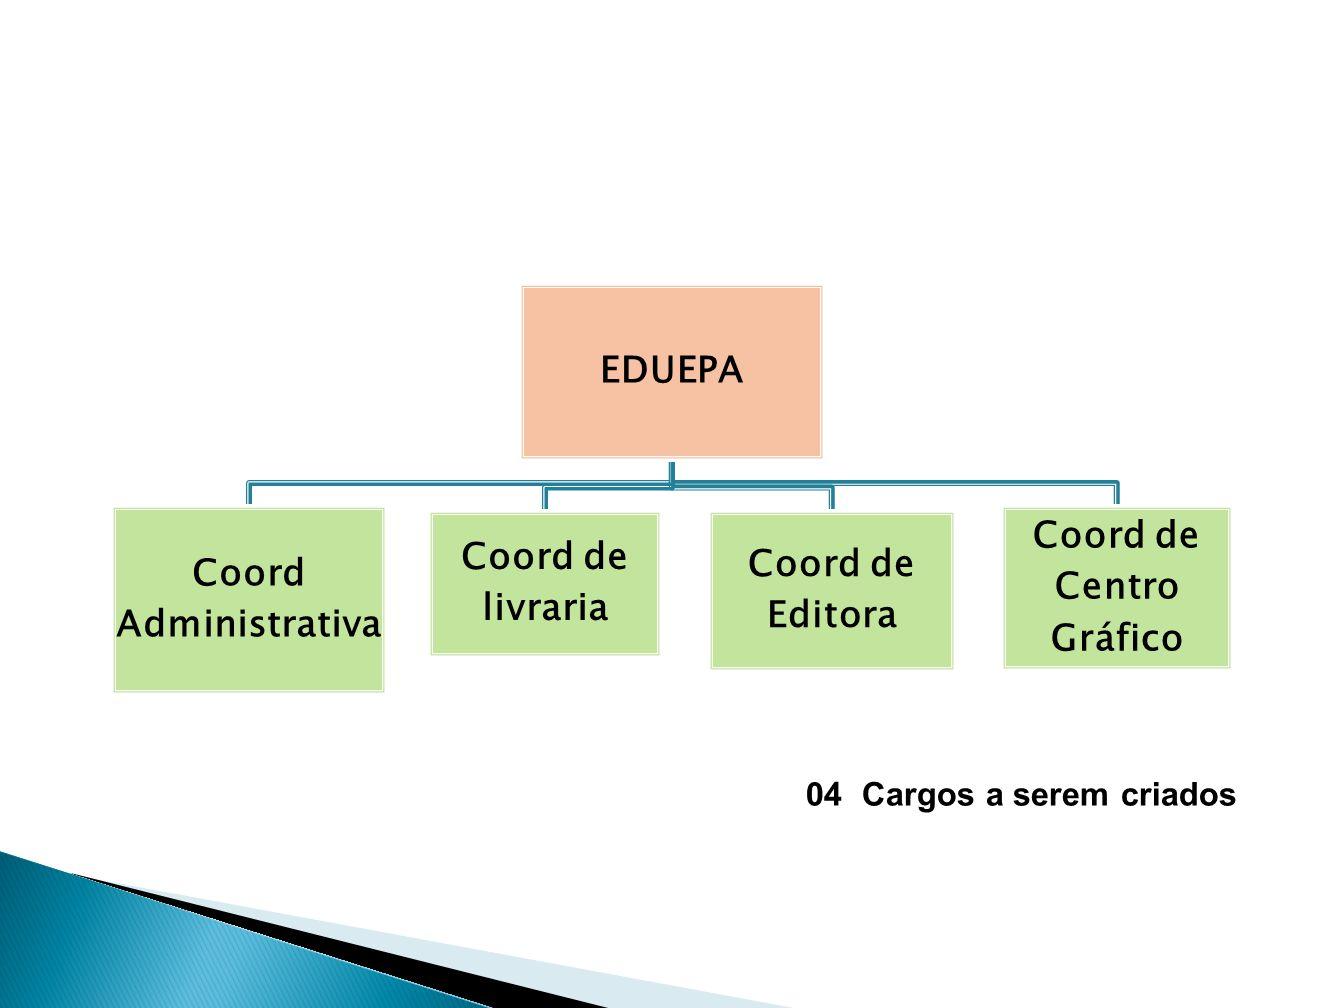 Coord de Centro Gráfico